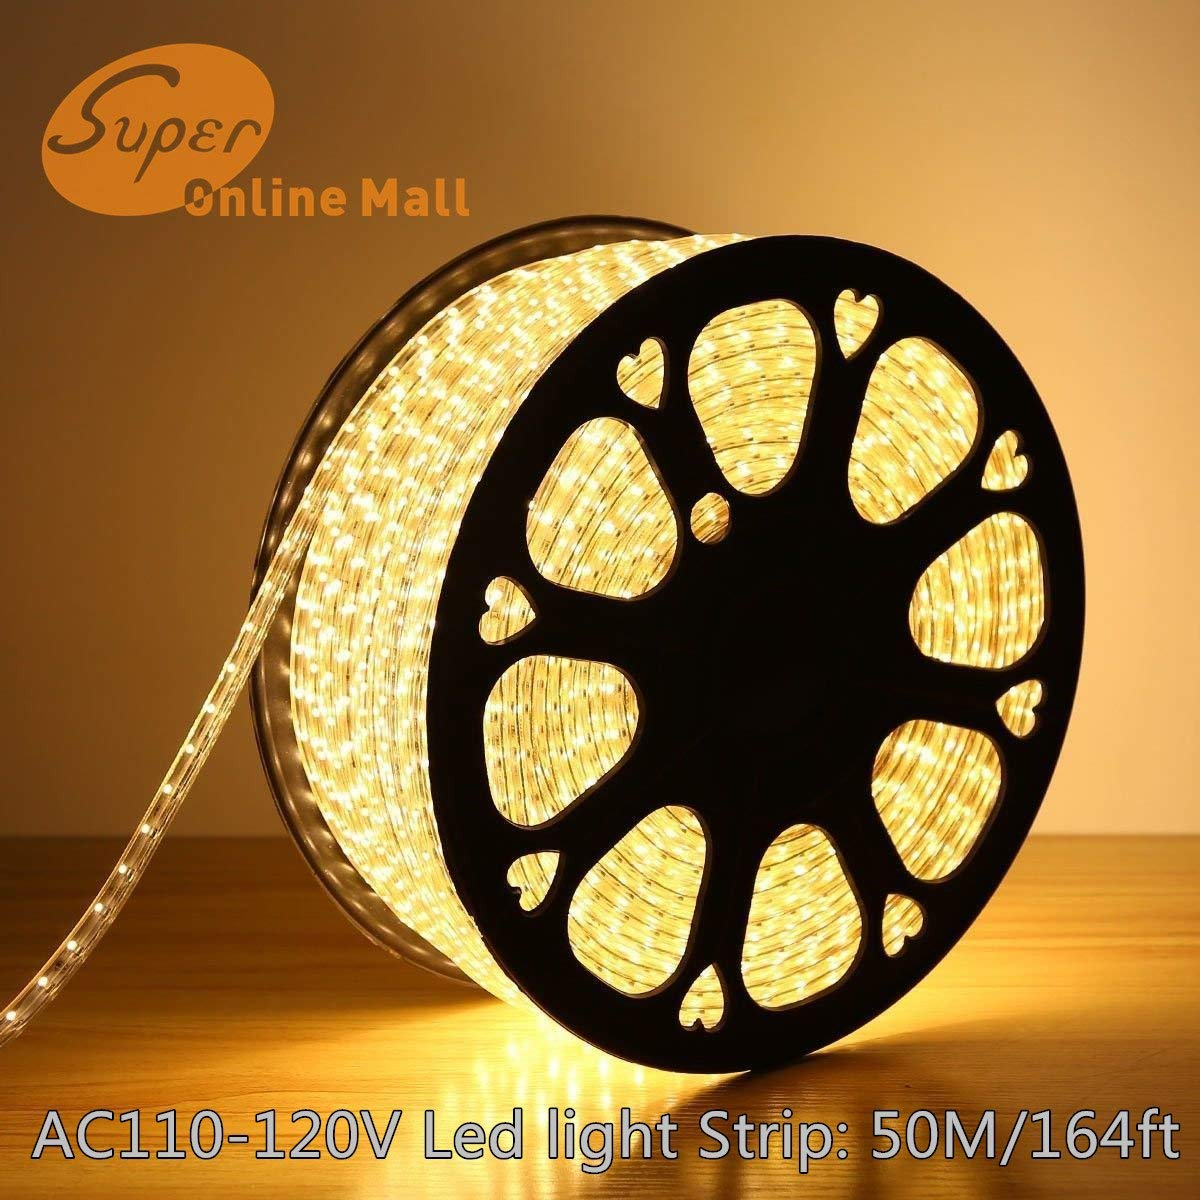 SuperonlineMall AC 110-120V Flexible Waterproof LED Strip Lights, 50m/164ft - Warm White